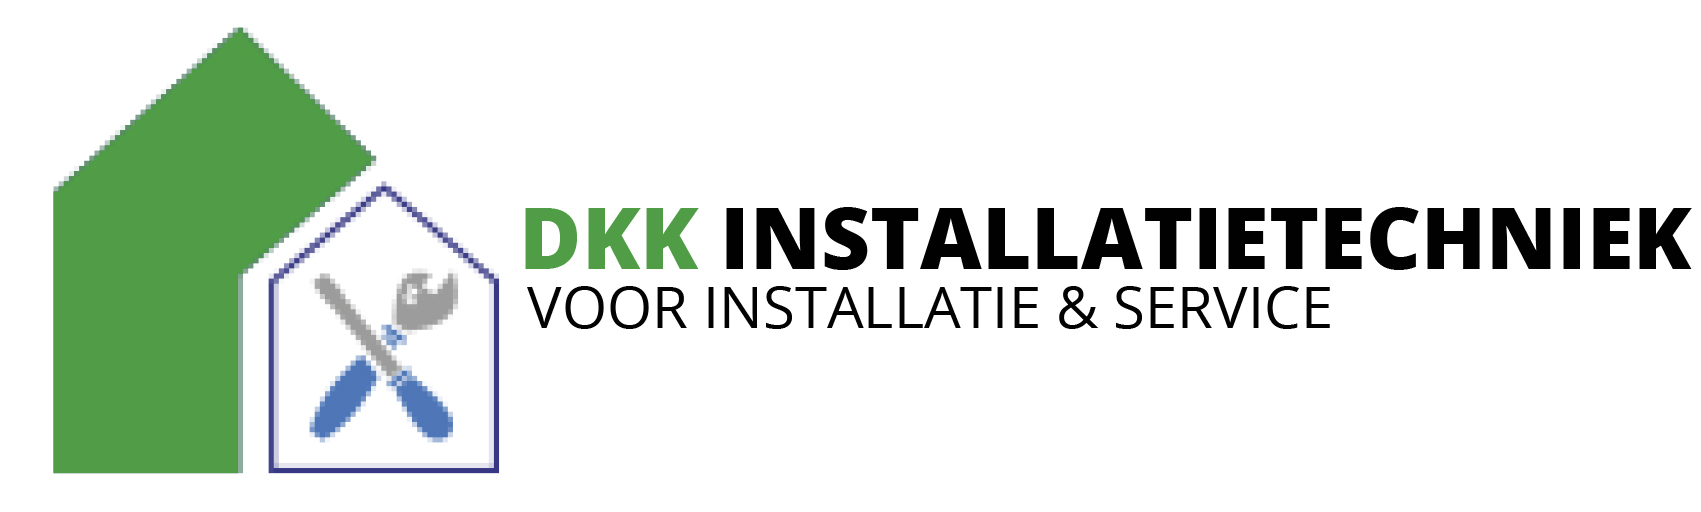 DKK Installatietechniek